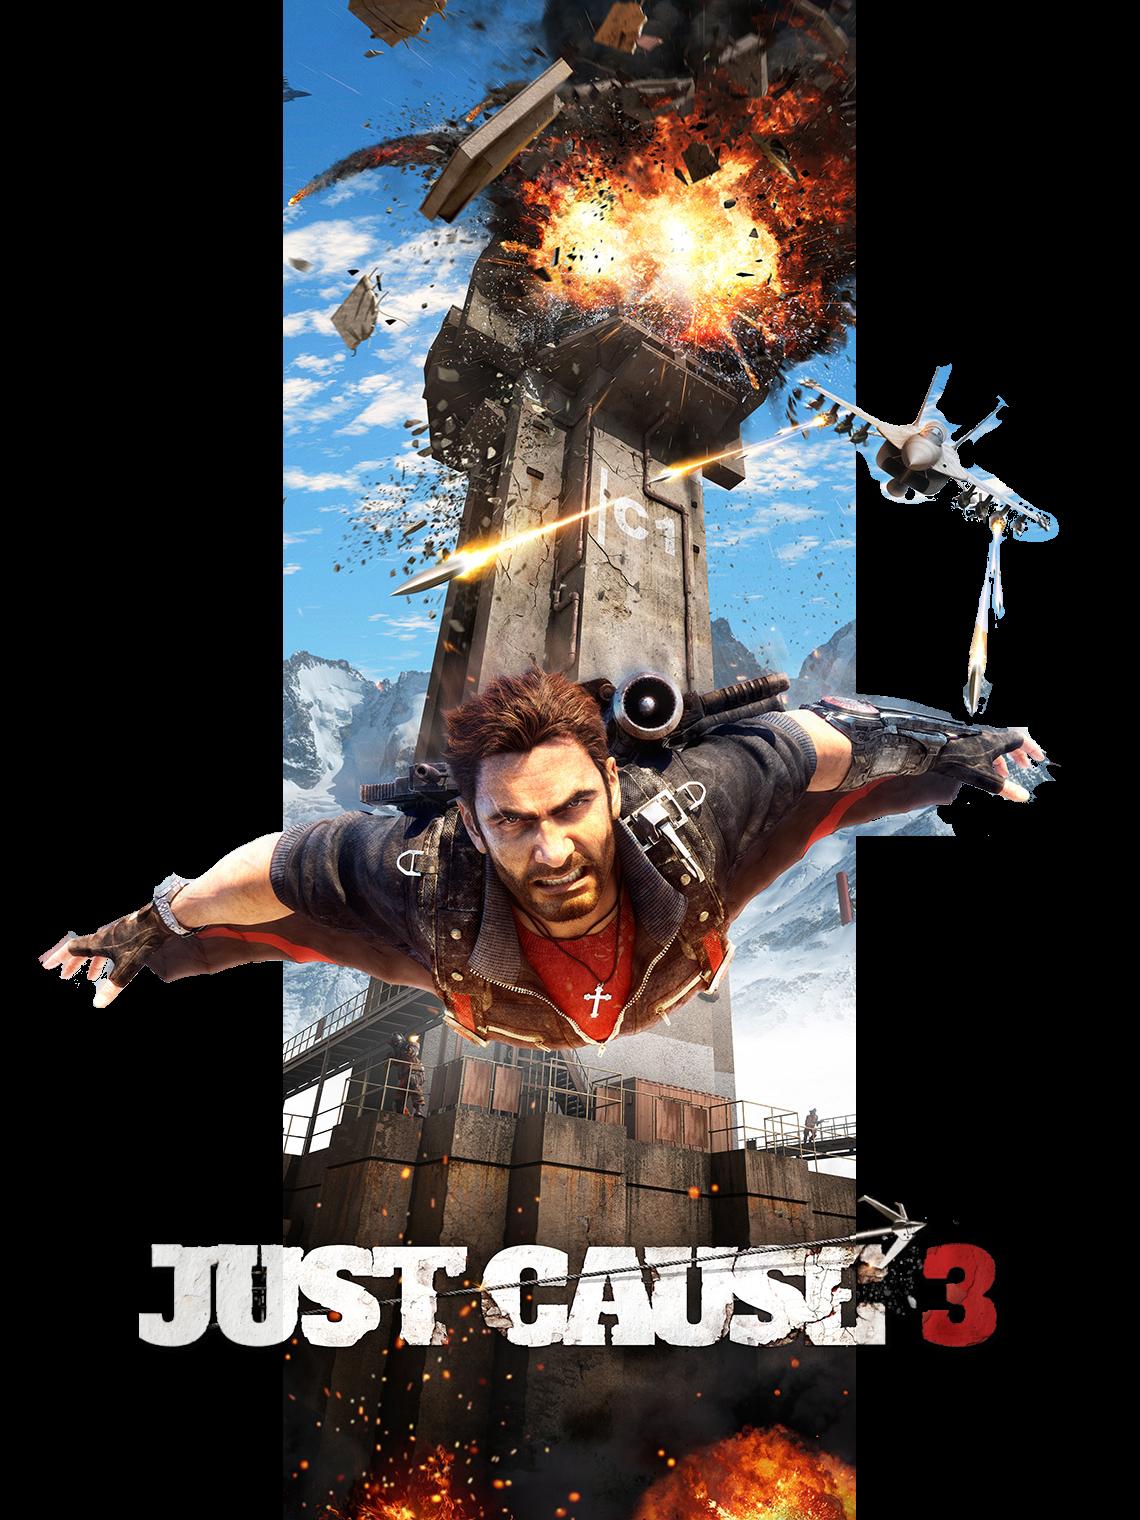 Just Cause 3 Just Cause 3 Deviantart Art